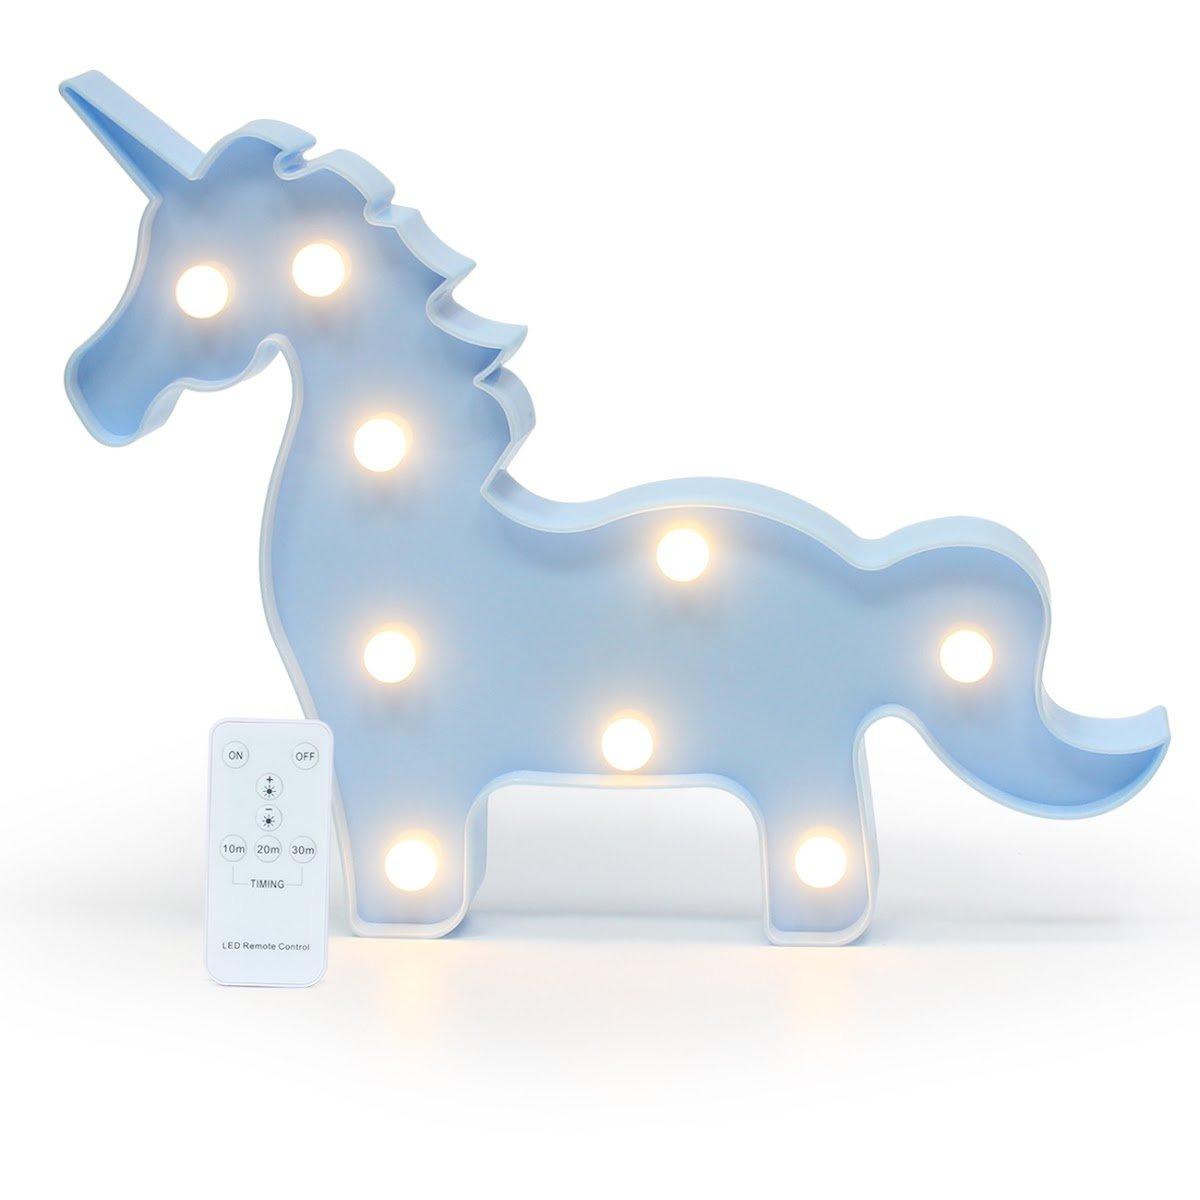 Mochiglory 3D Unicorn Tree Rabbit Star Shaped Animal Light Table Lamp Marquee Unicorn Sign LED Nightlight Home Decoration Battery Operated